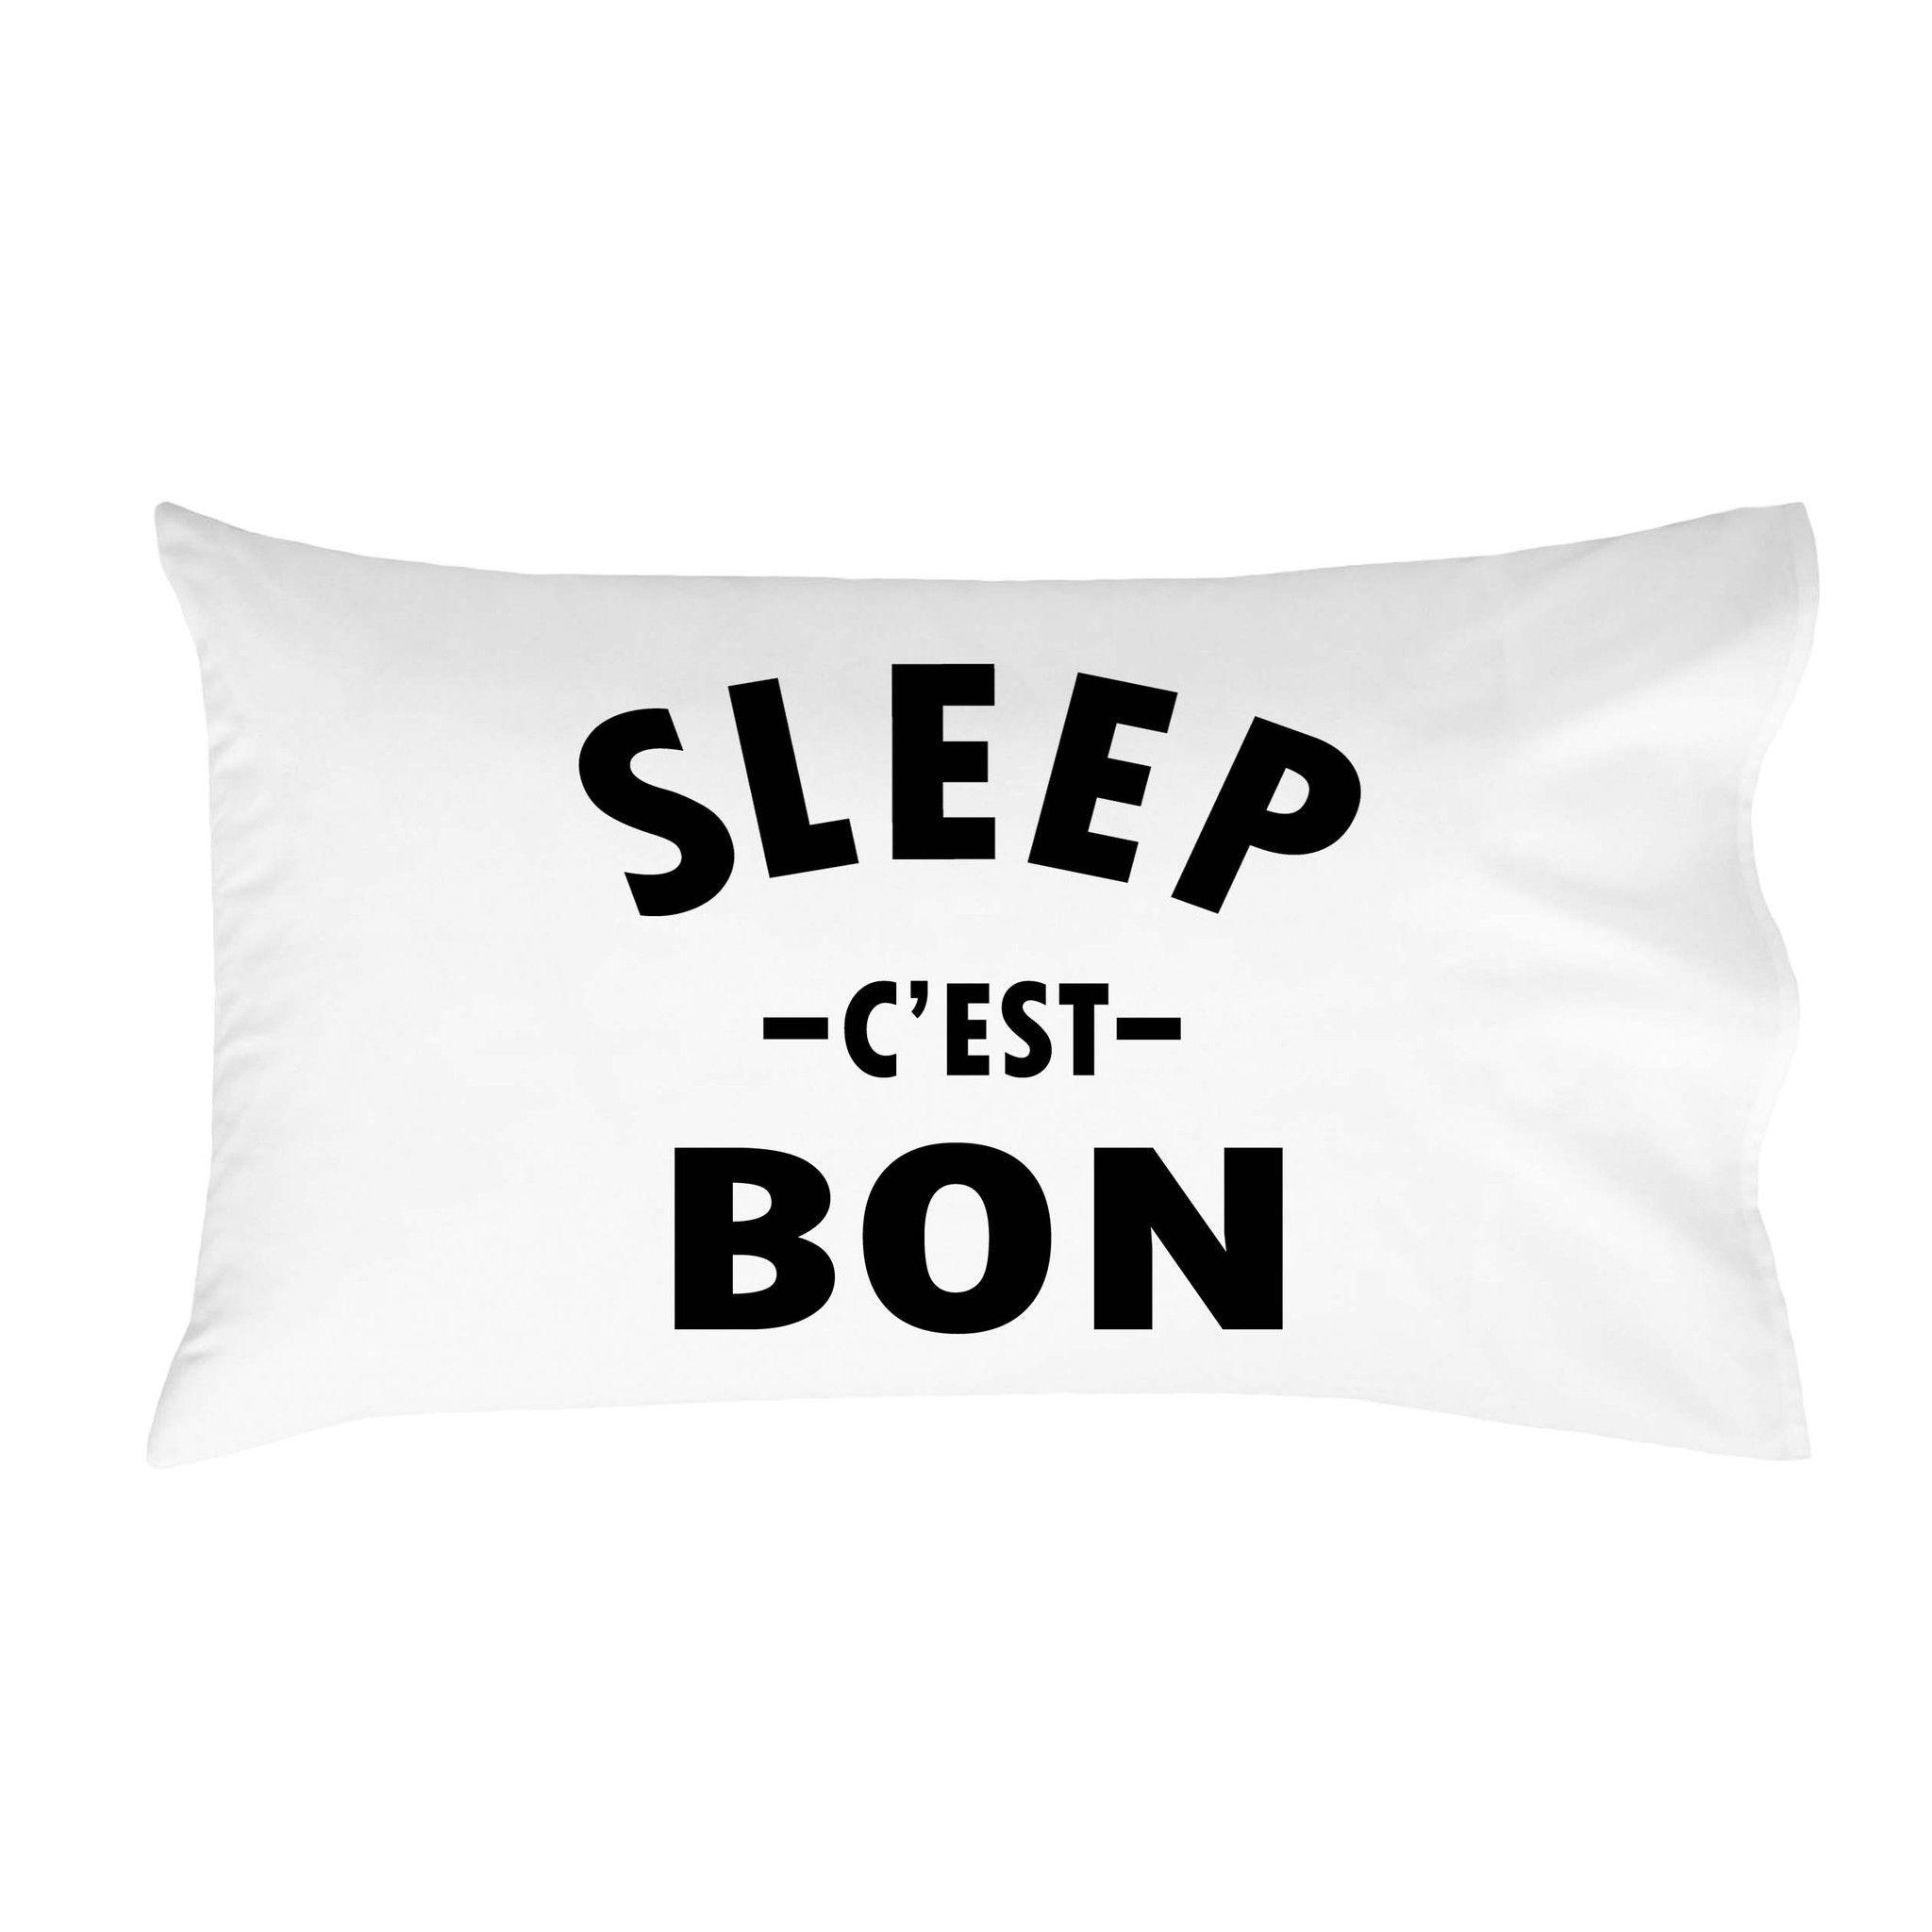 Sleep cuest bon